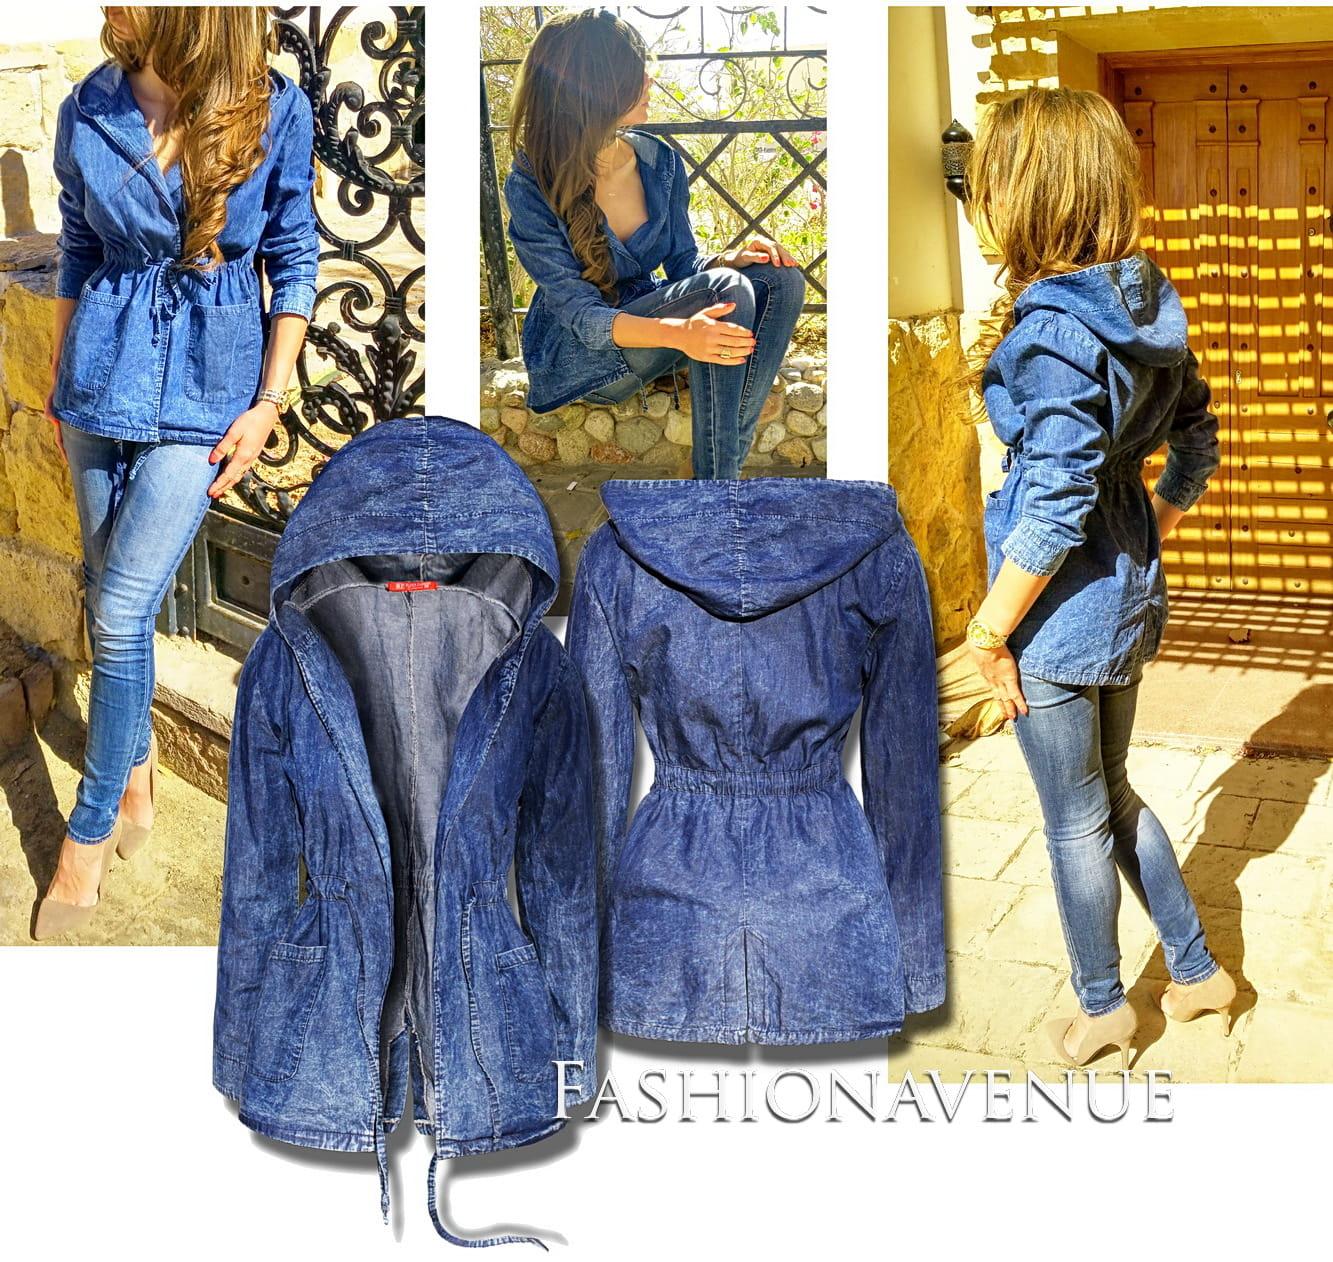 a0e439f8d1045 ... kurtka damska parka kaptur fashionavenue jeans marmurek dekatyzowany  wiosna lato #114 fashionavenue.pl ...